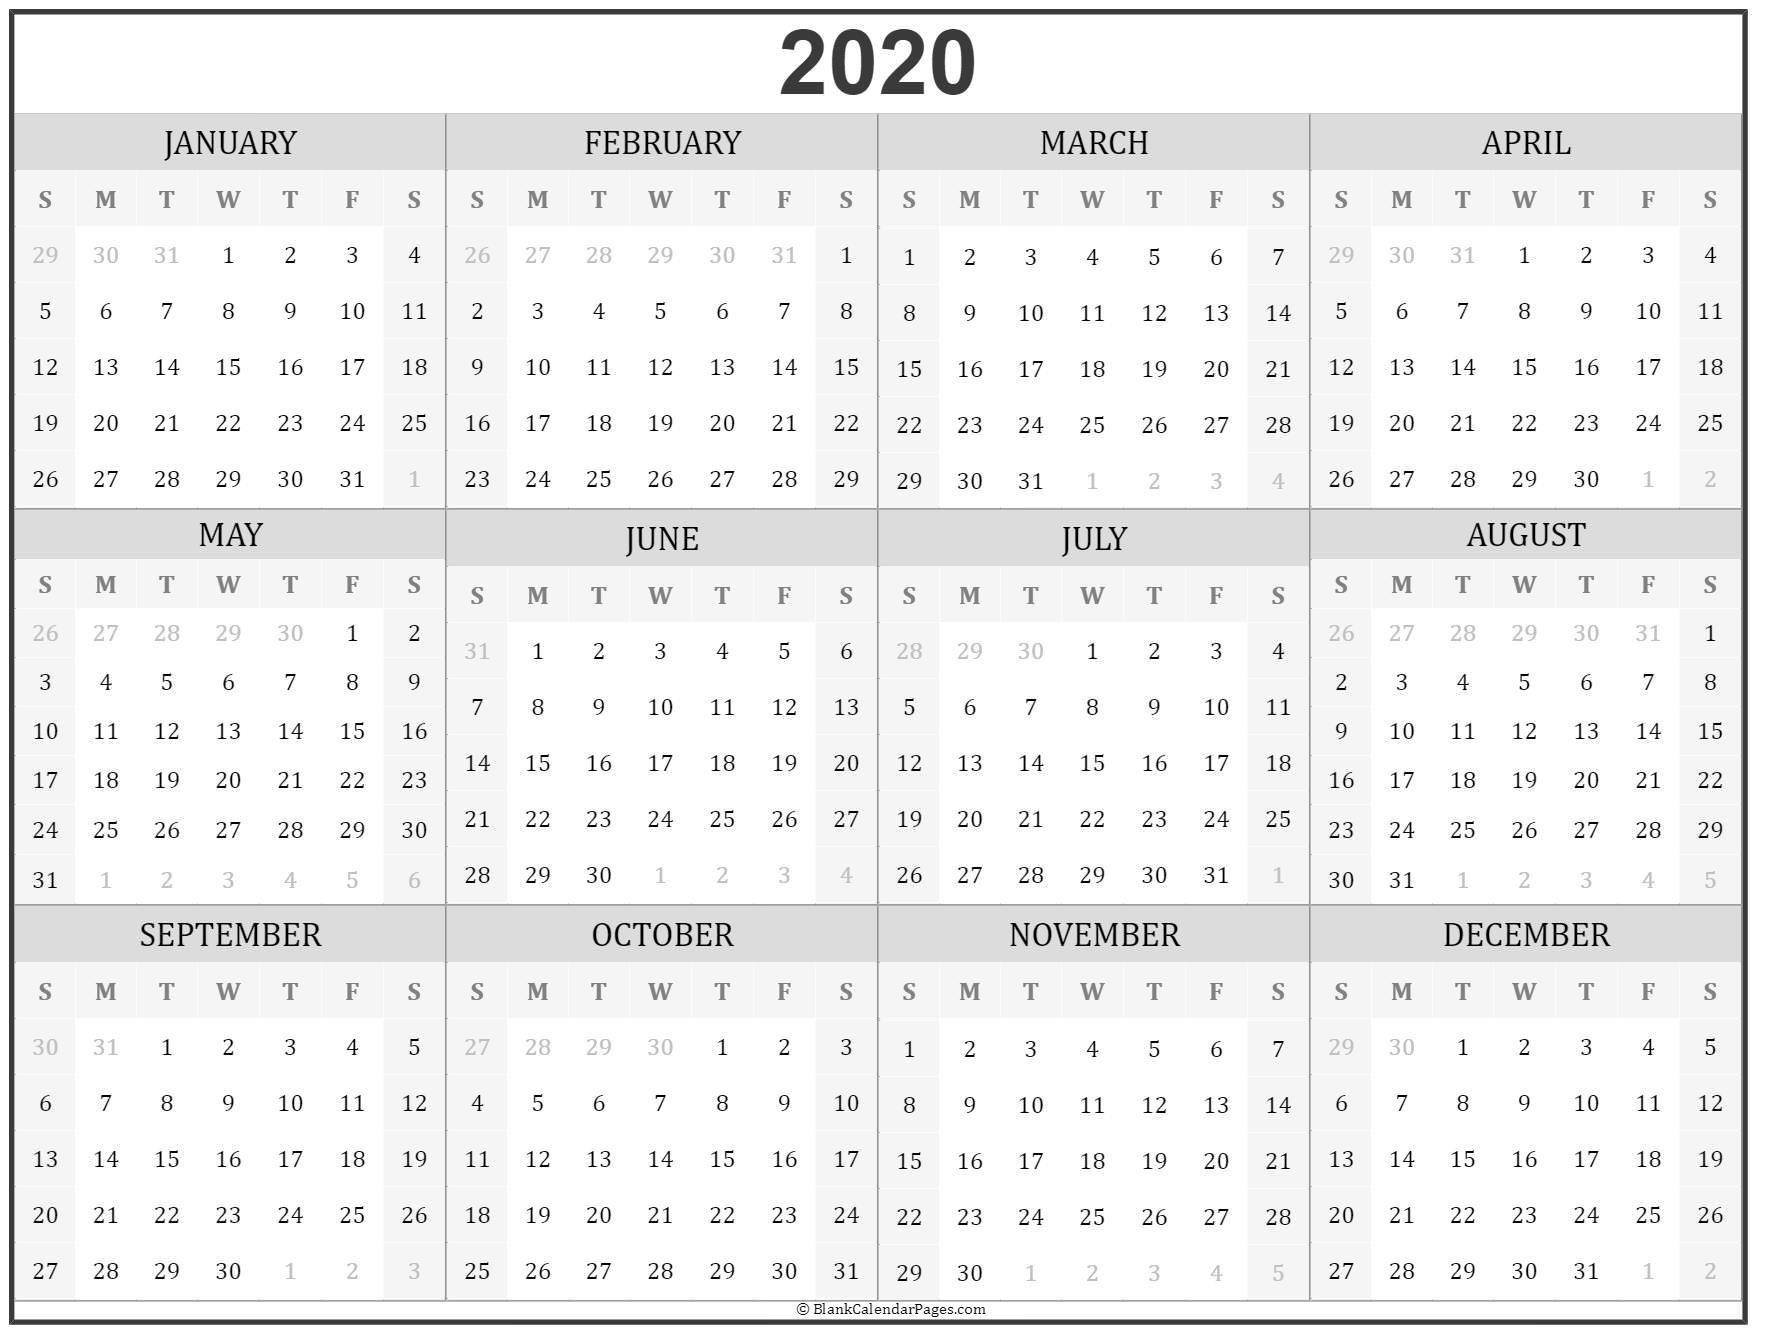 2020 Year Calendar | Yearly Printable-2021 Calendar Fill In